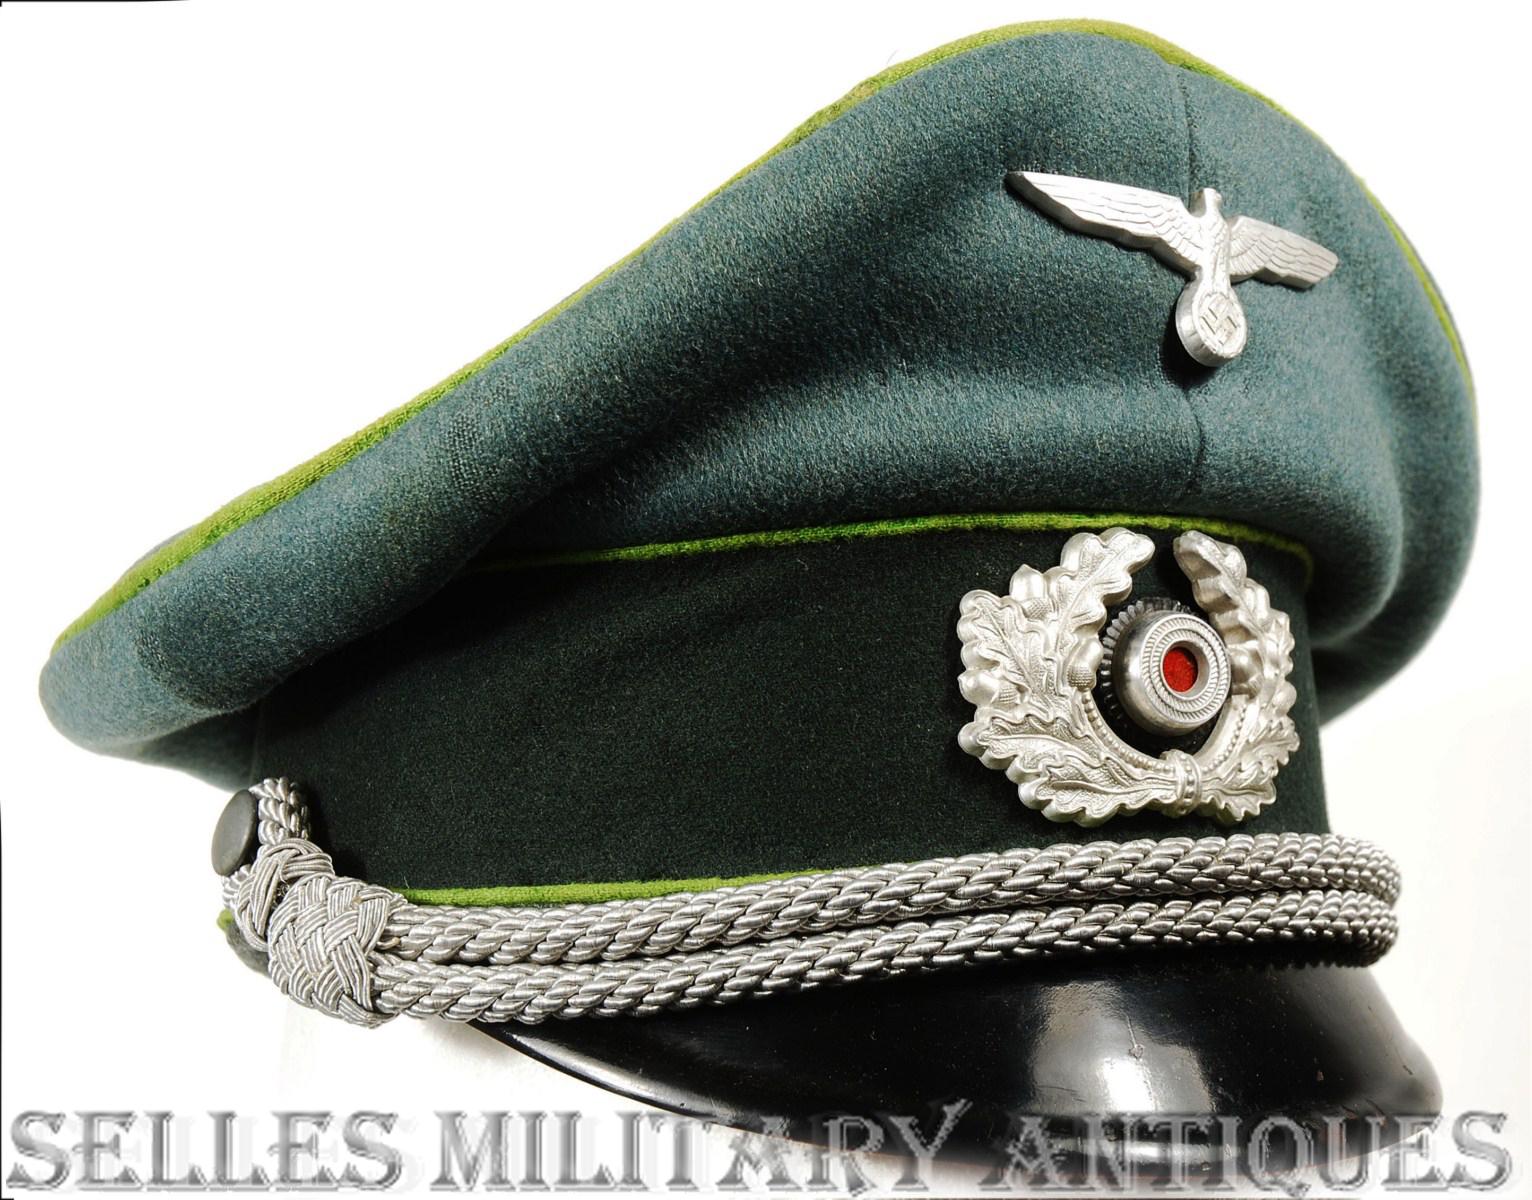 static line military jean michel selles casquette officier panzer grenadier allemand. Black Bedroom Furniture Sets. Home Design Ideas